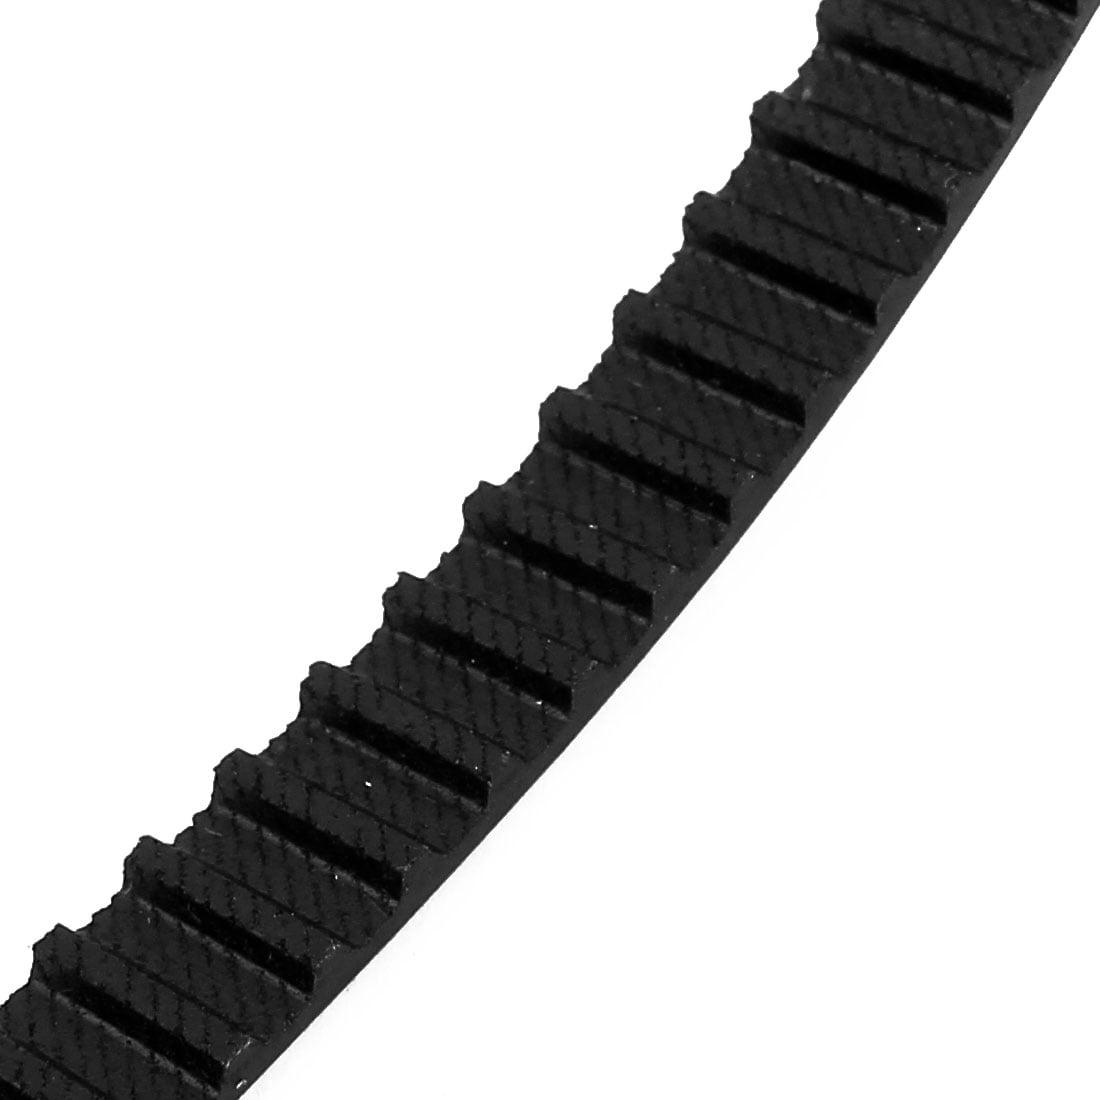 390 XL 195 Teeth Synchronous Closed Loop Rubber Timing Belt 990mm Perimeter - image 2 of 3